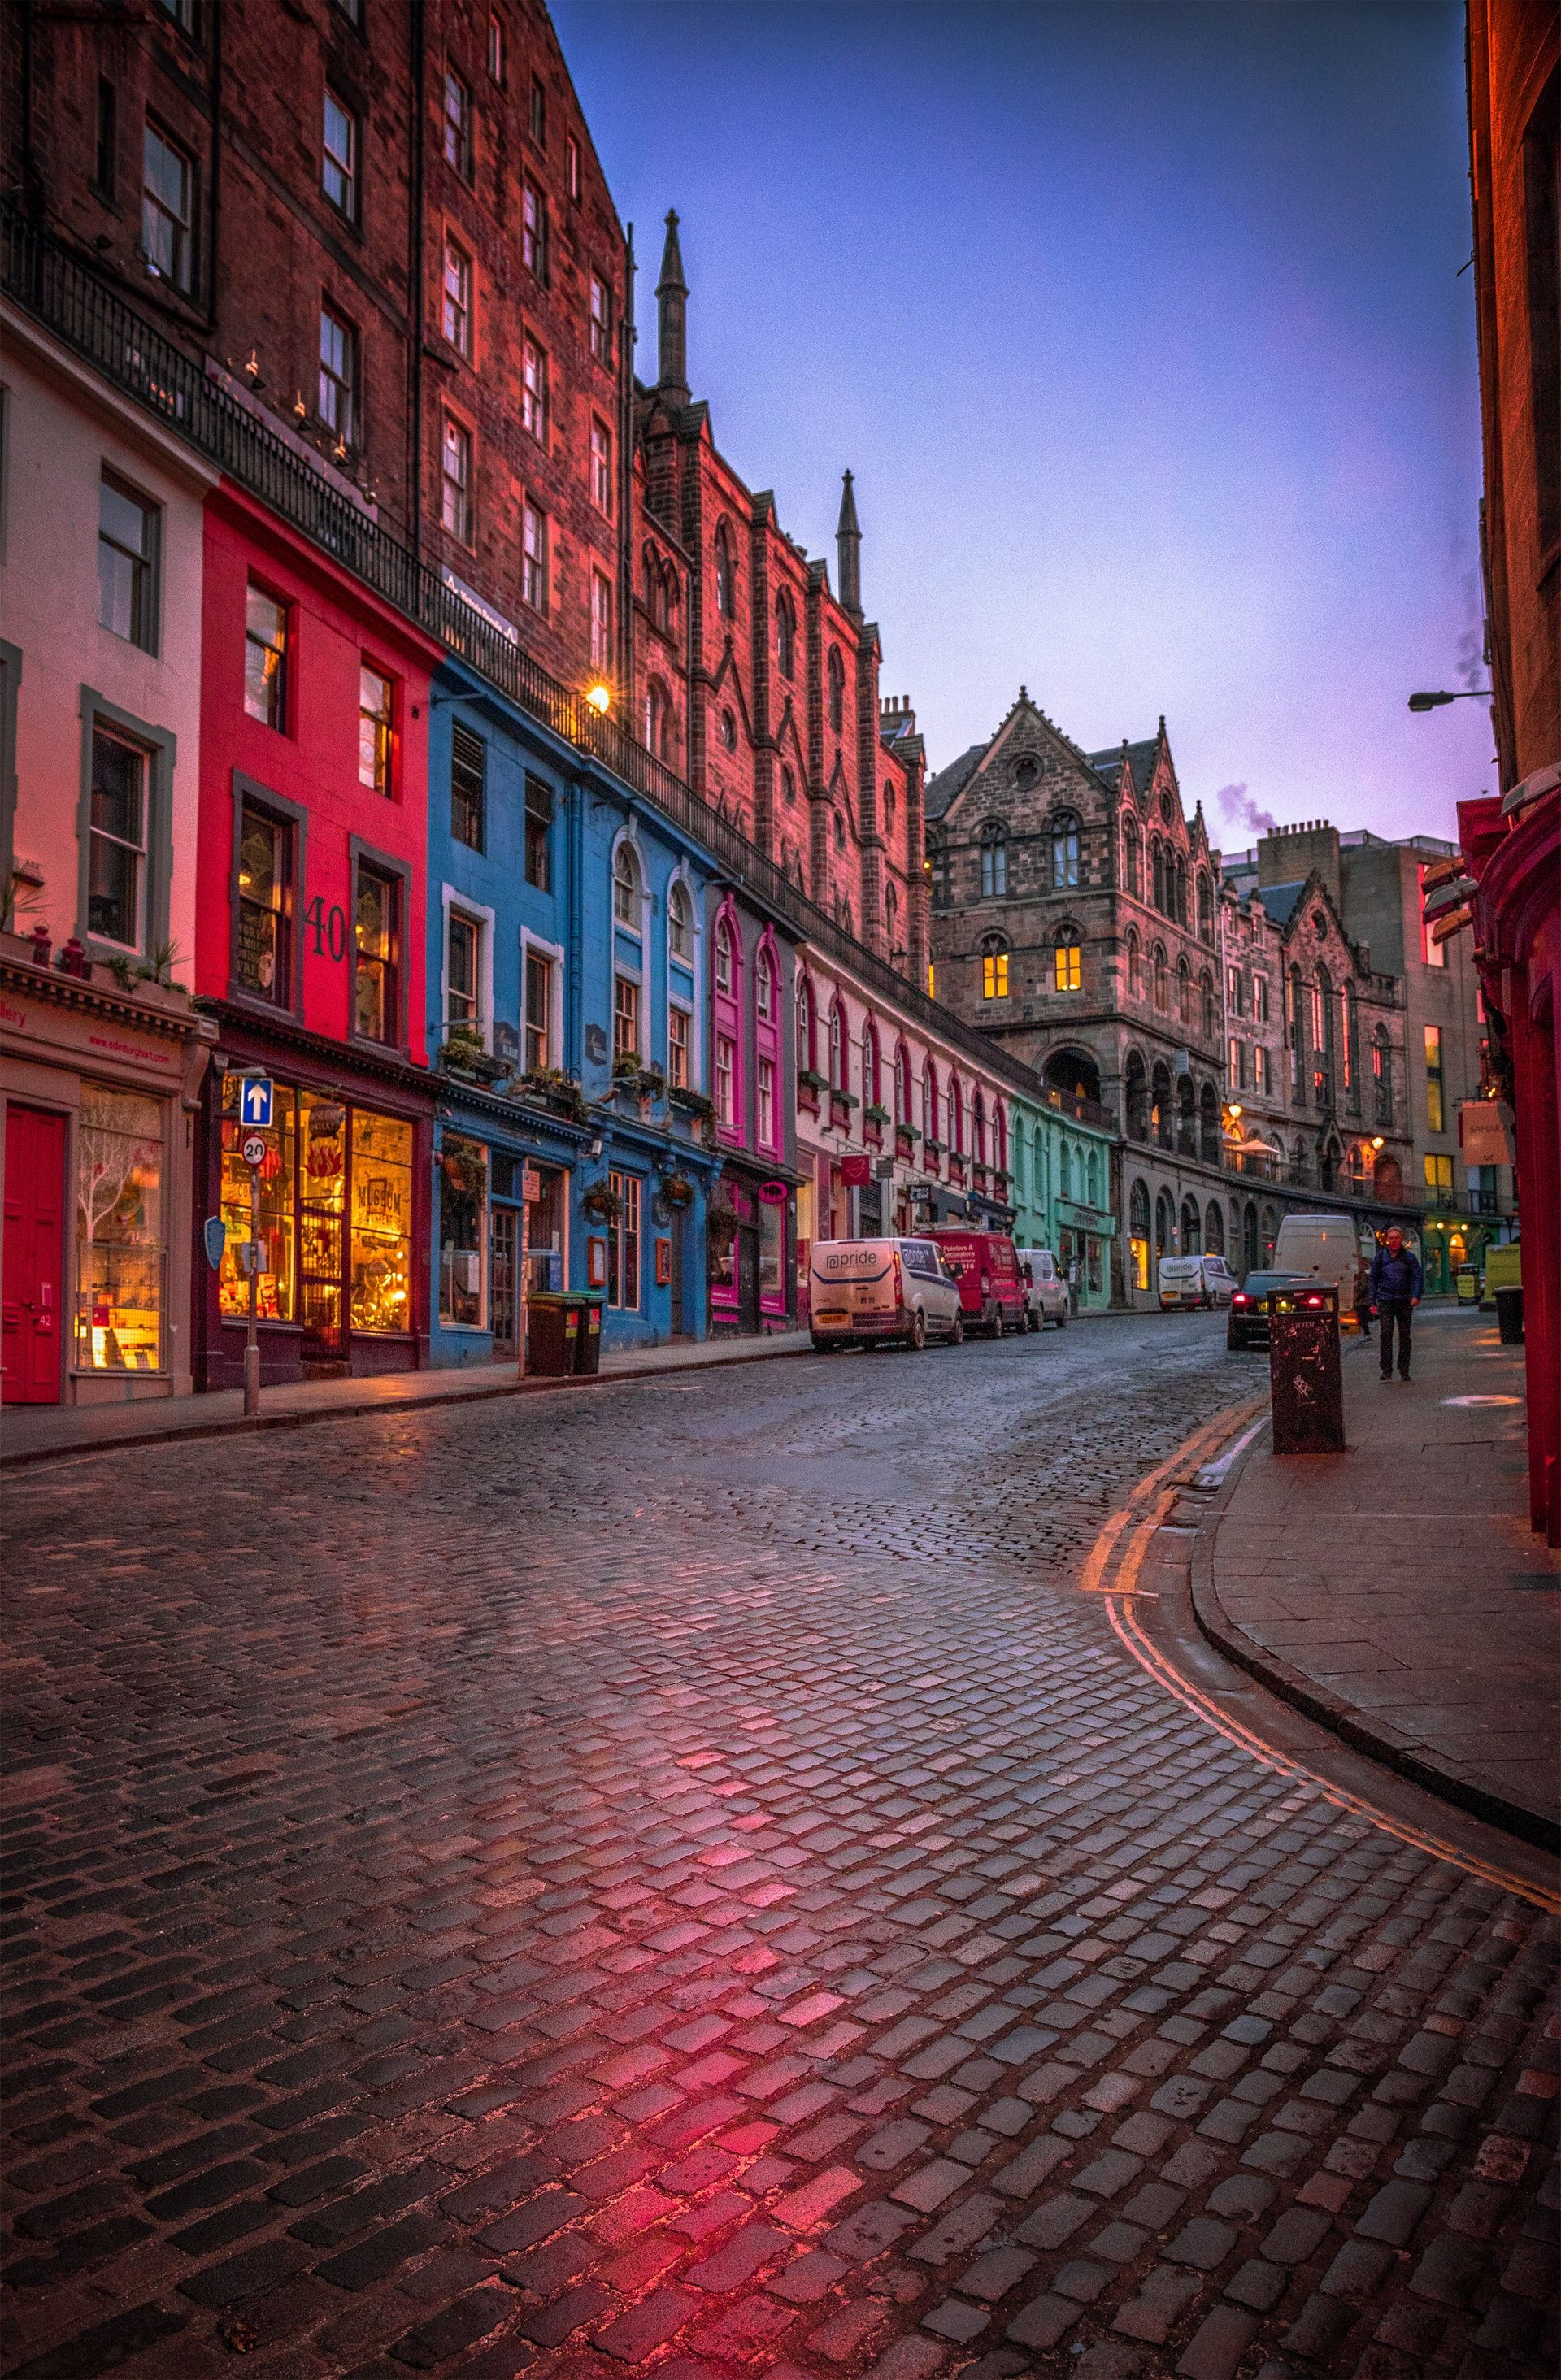 PLAN B: Could Edinburgh be capital of a country enjoying Home Rule?